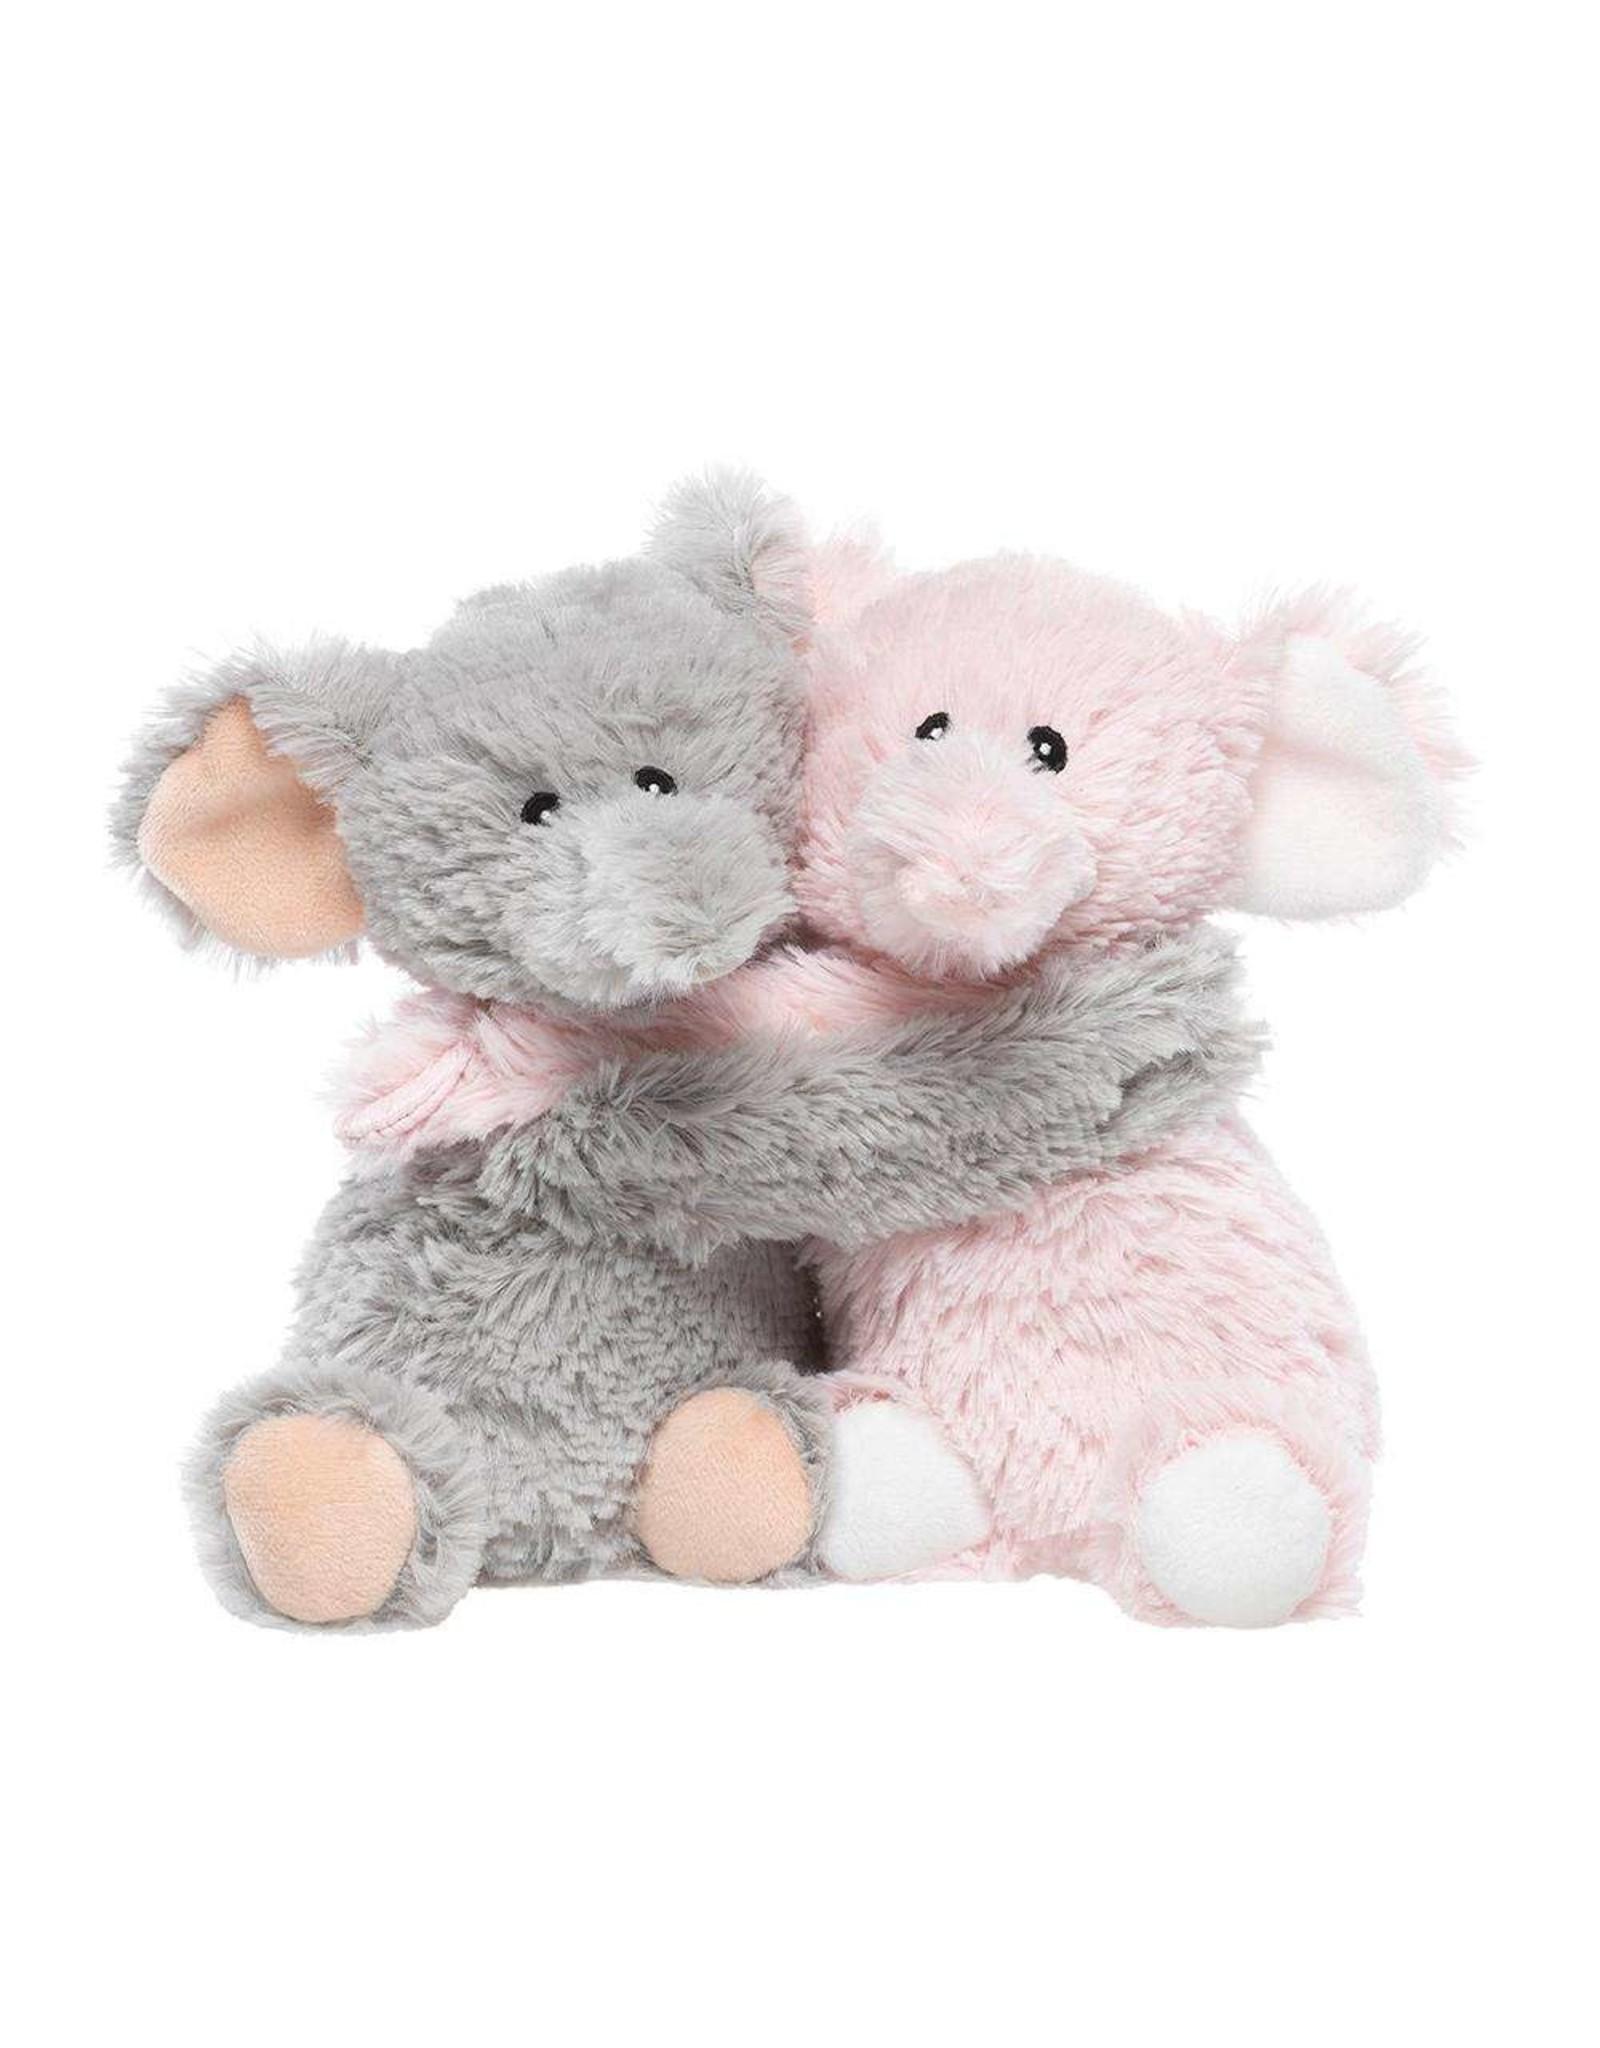 Warmies Warmies Hugs  ELEPHANTS